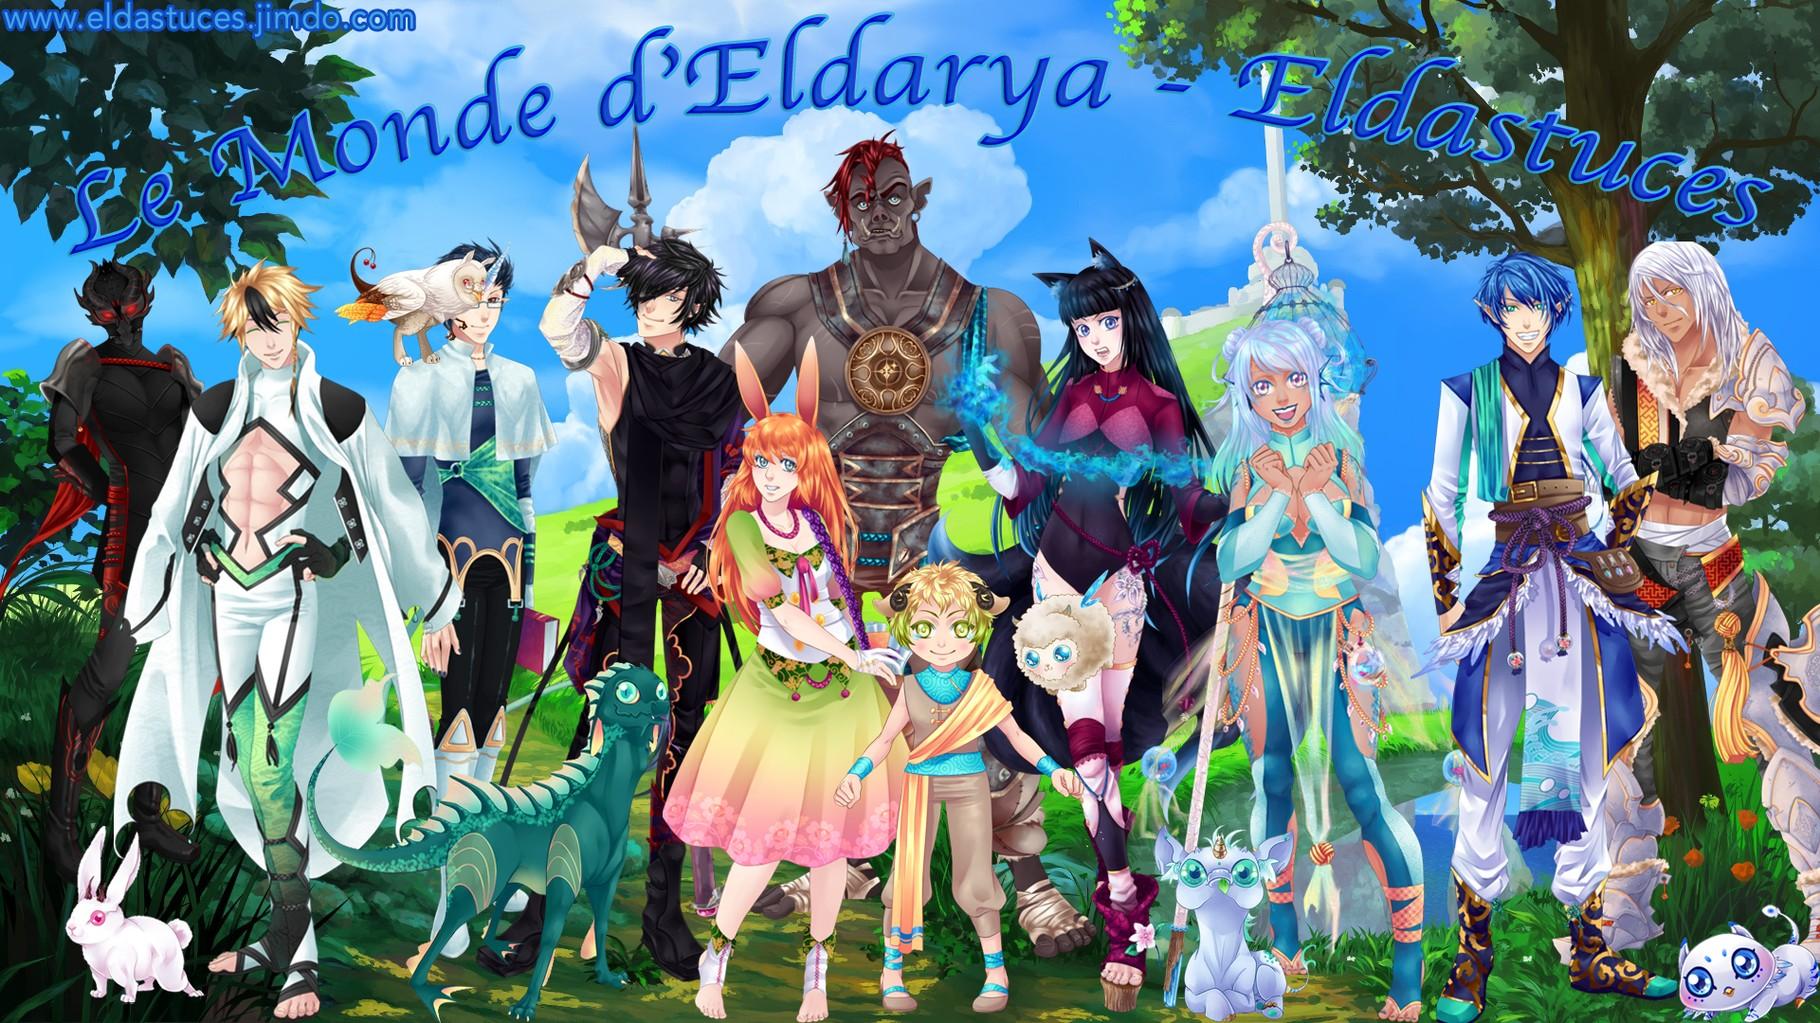 Quel personnage d'Eldarya es-tu ?